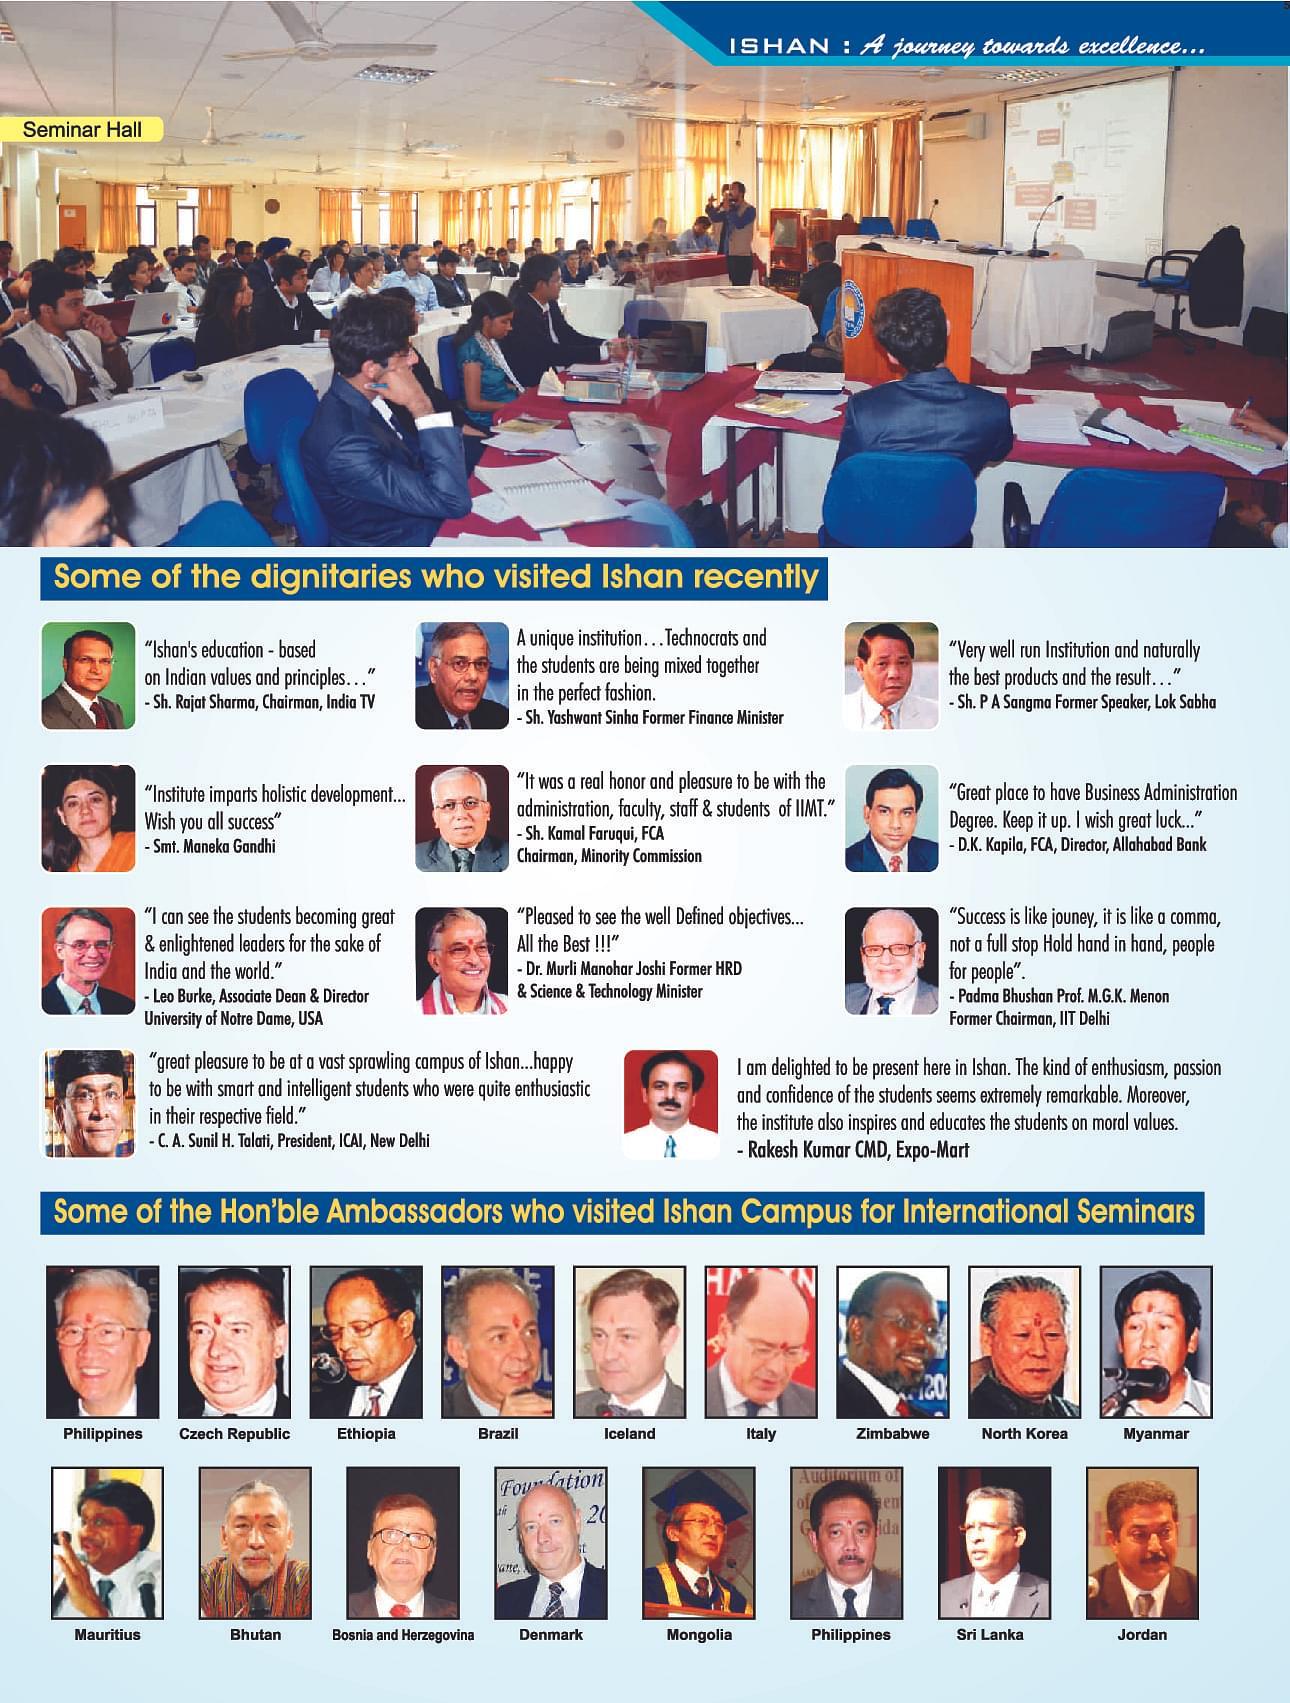 ishan nagar Ishan 3 satellite ahmedabad - price, resale, floor plans, construction status, brochure, location, images, reviews, news of ishan 3 by vishwanath group.